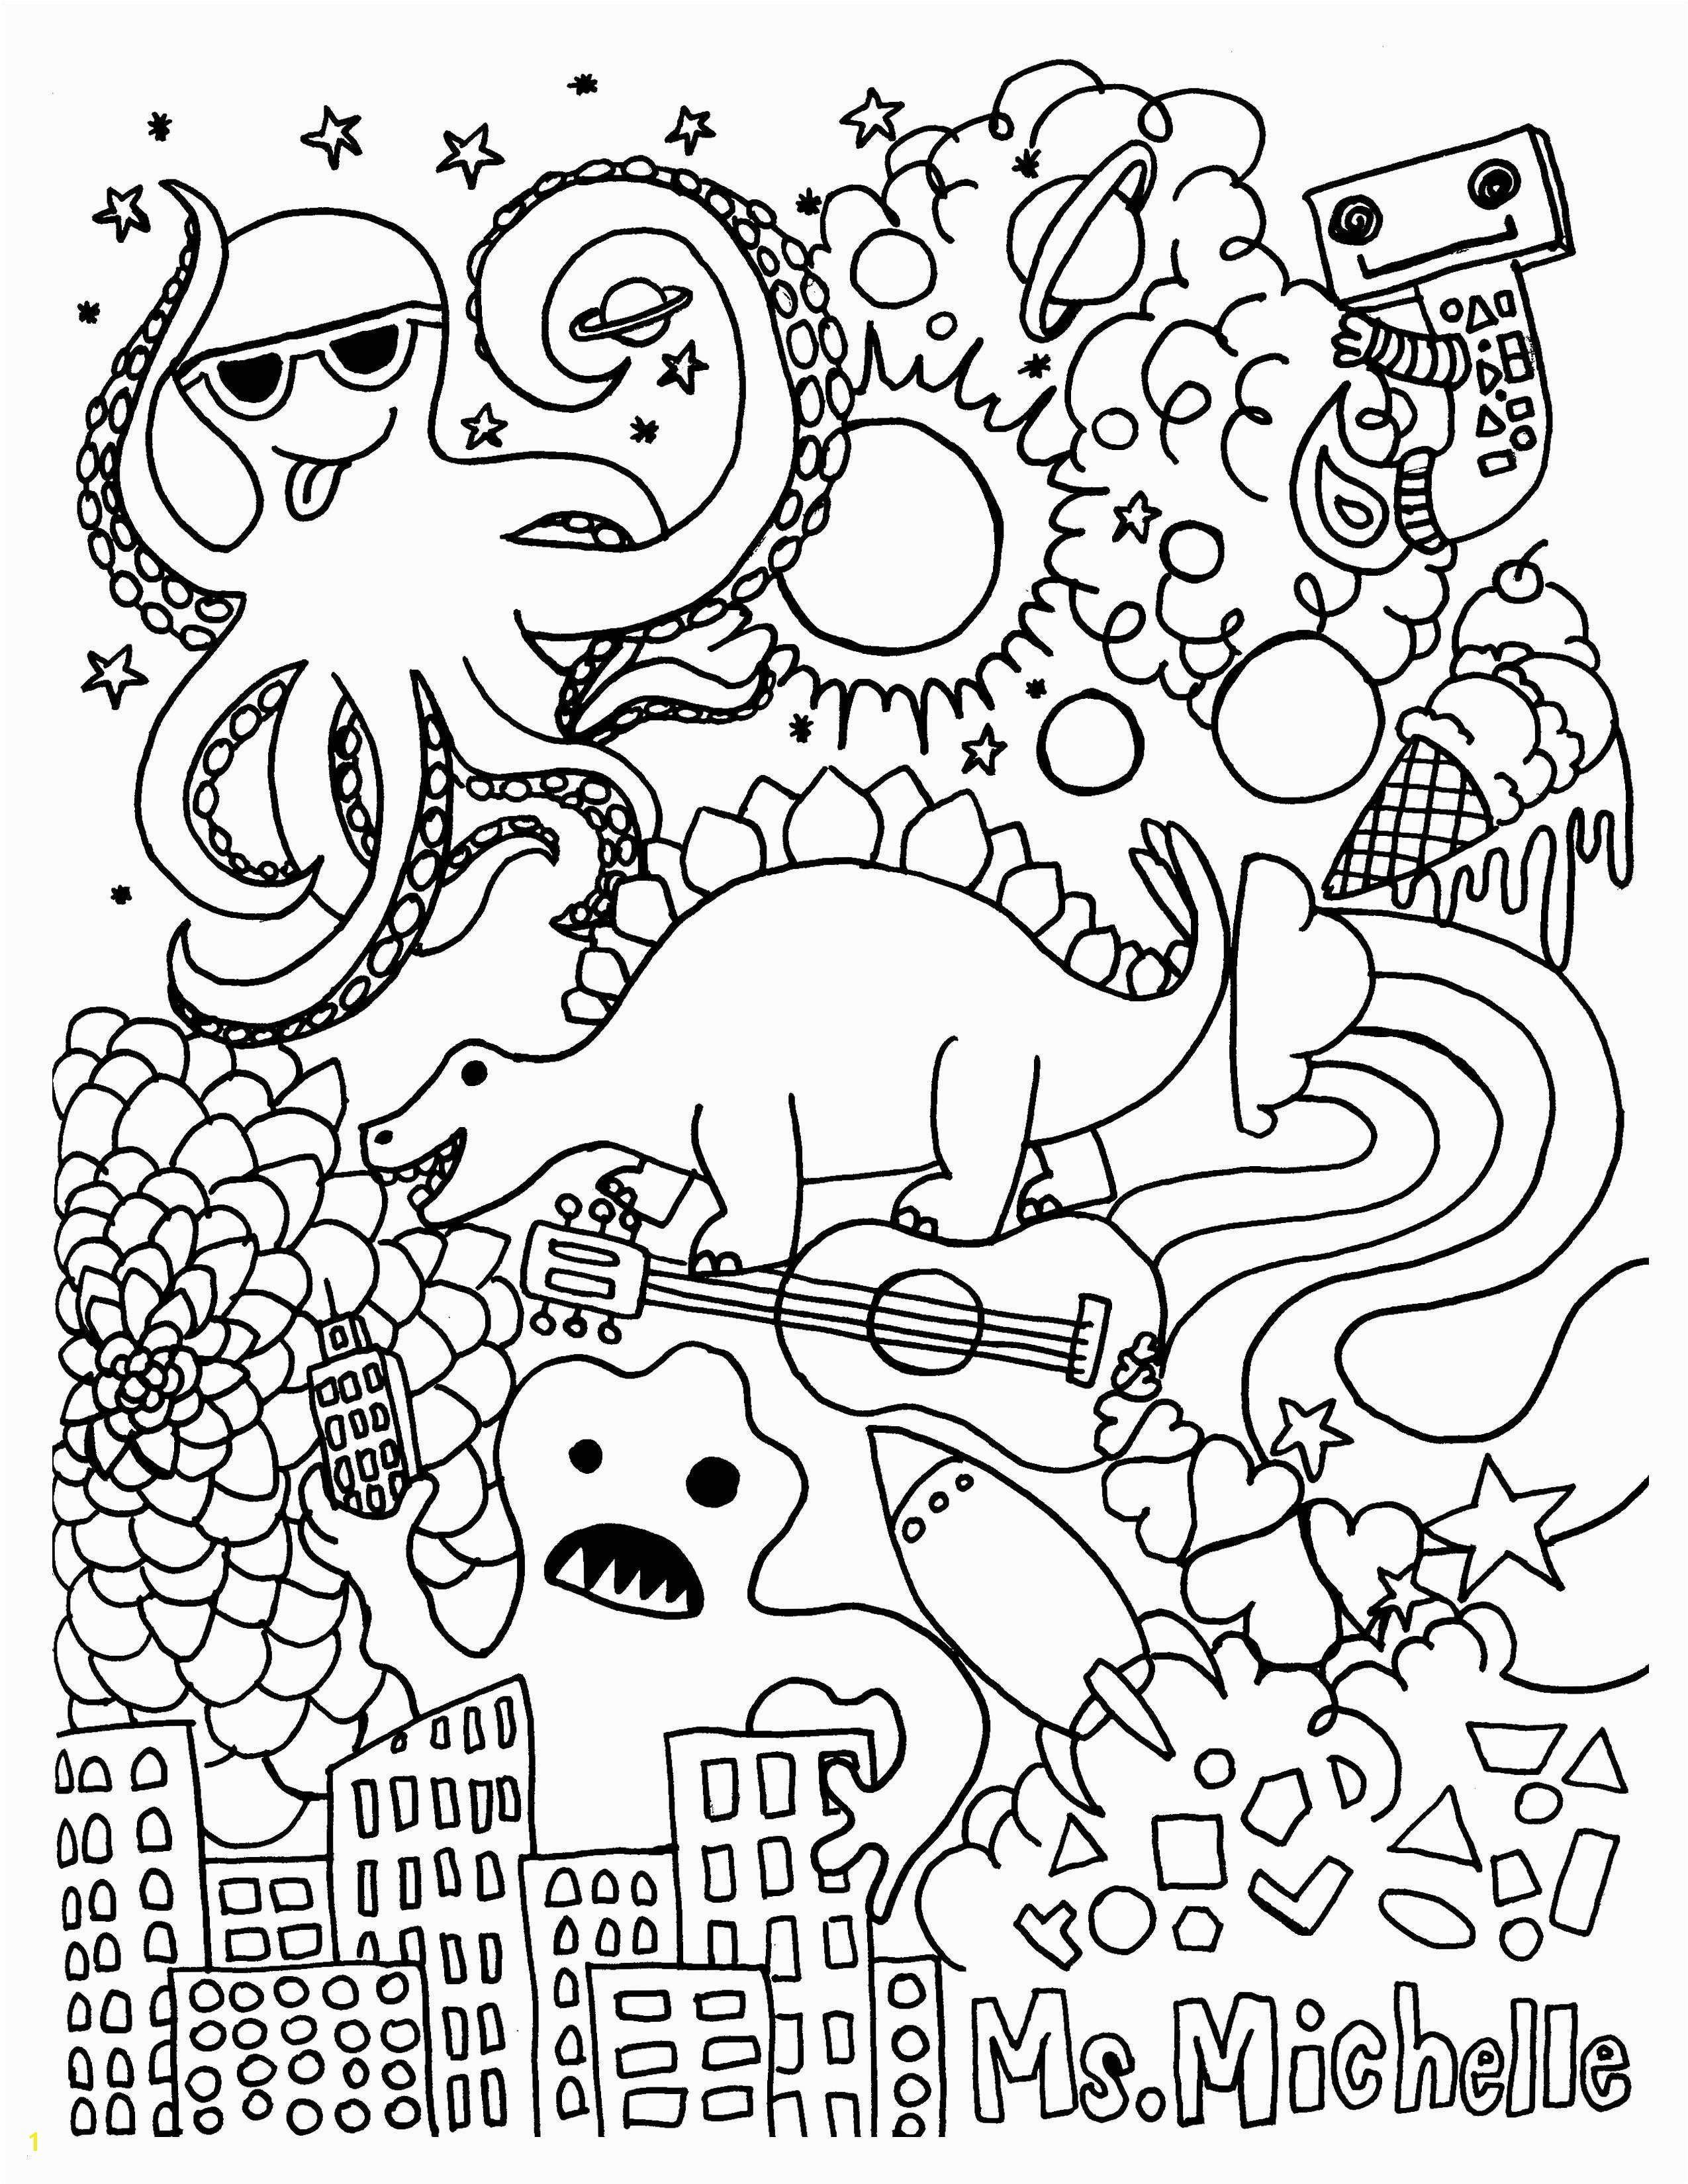 Baby Jesus Coloring Page Wonderful Coloring Pages Baby Jesusbaby Jesus Coloring Pages